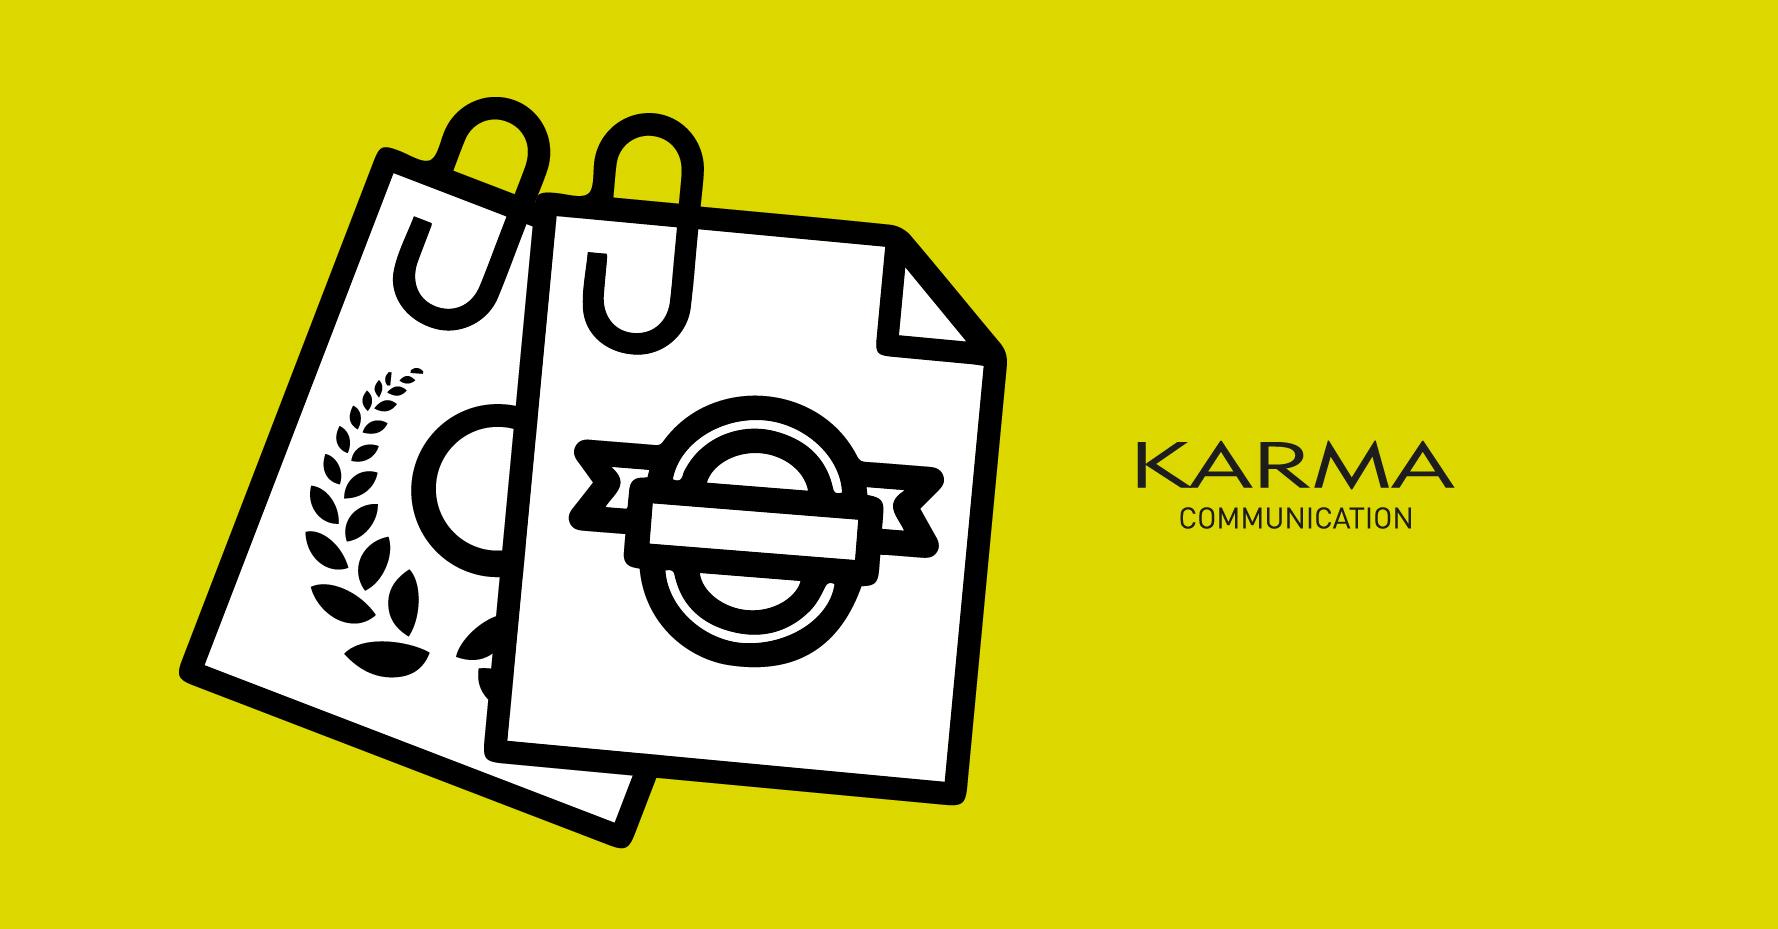 Karma Communication - Loghi in cartoncino